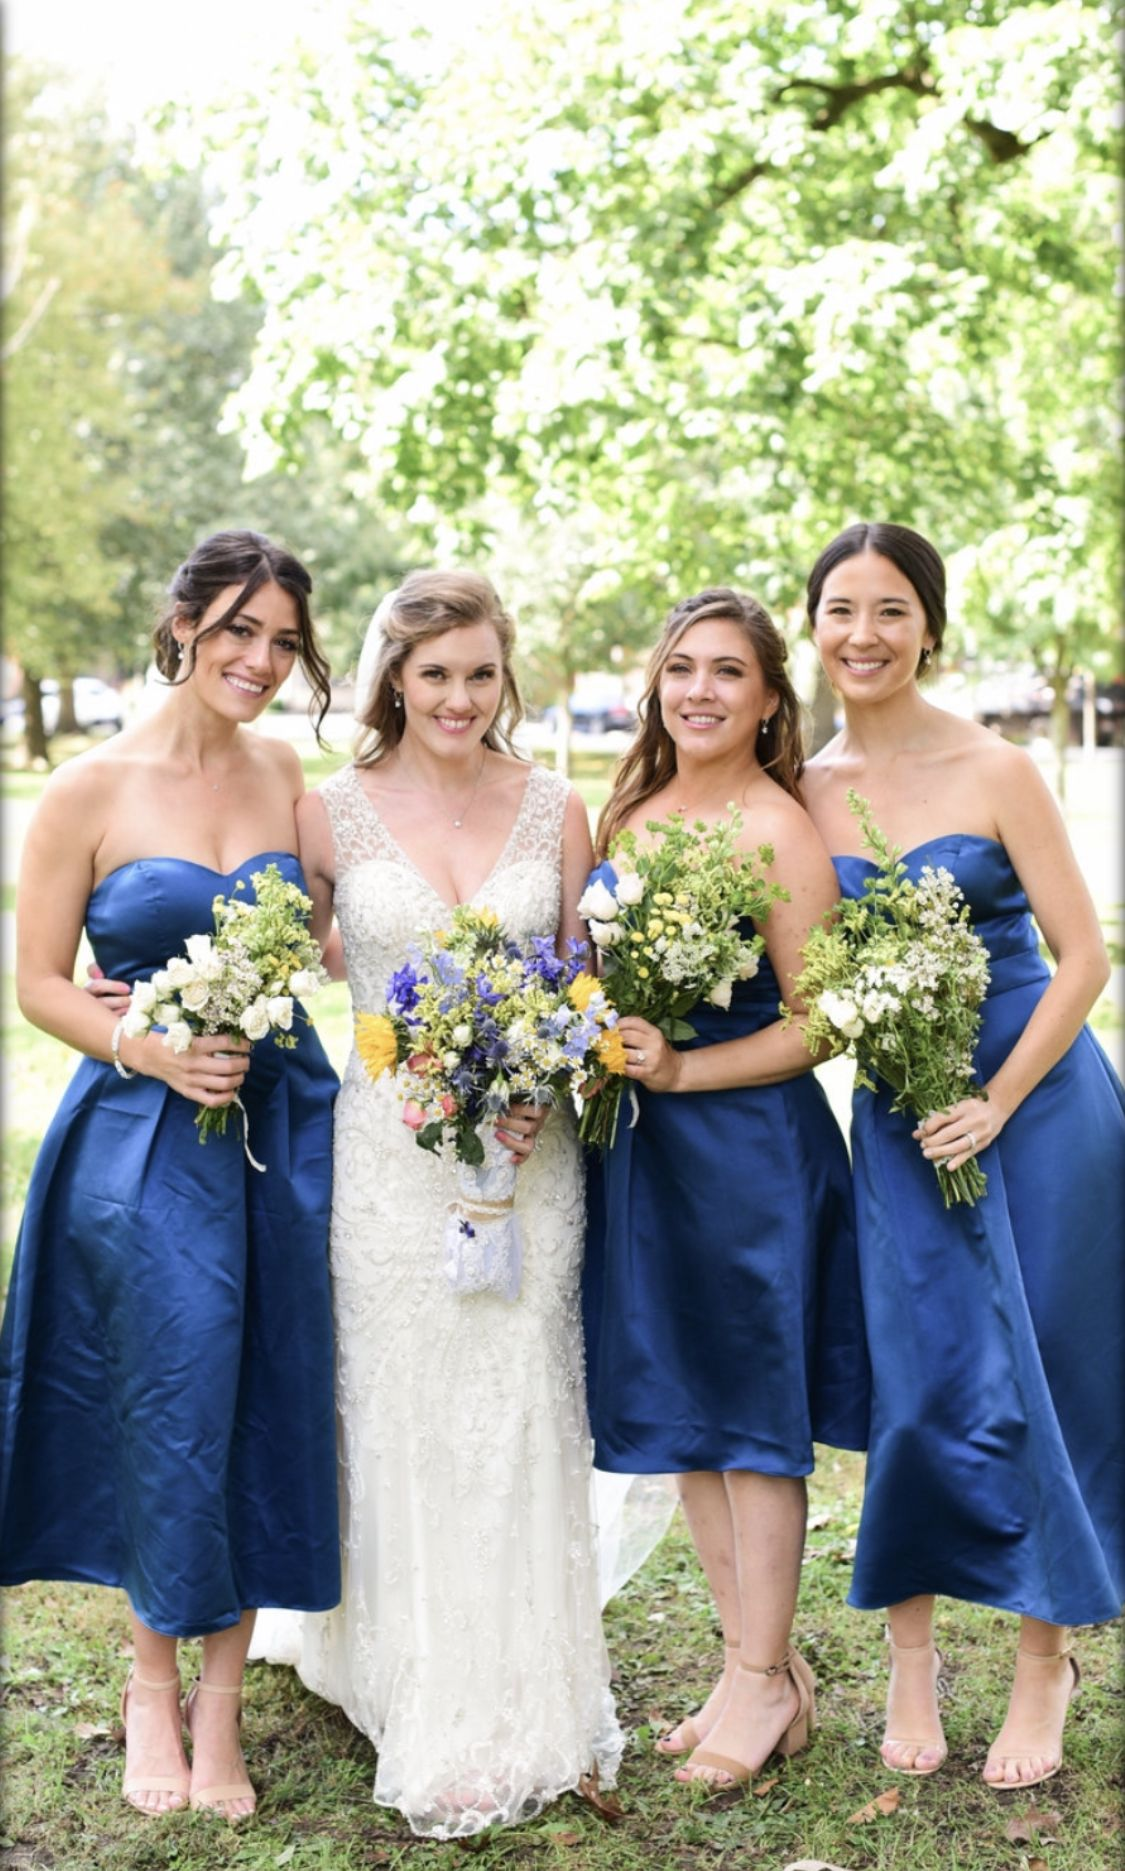 Bridemaid Photo Blue Bridesmaid Dresses Schiller Park